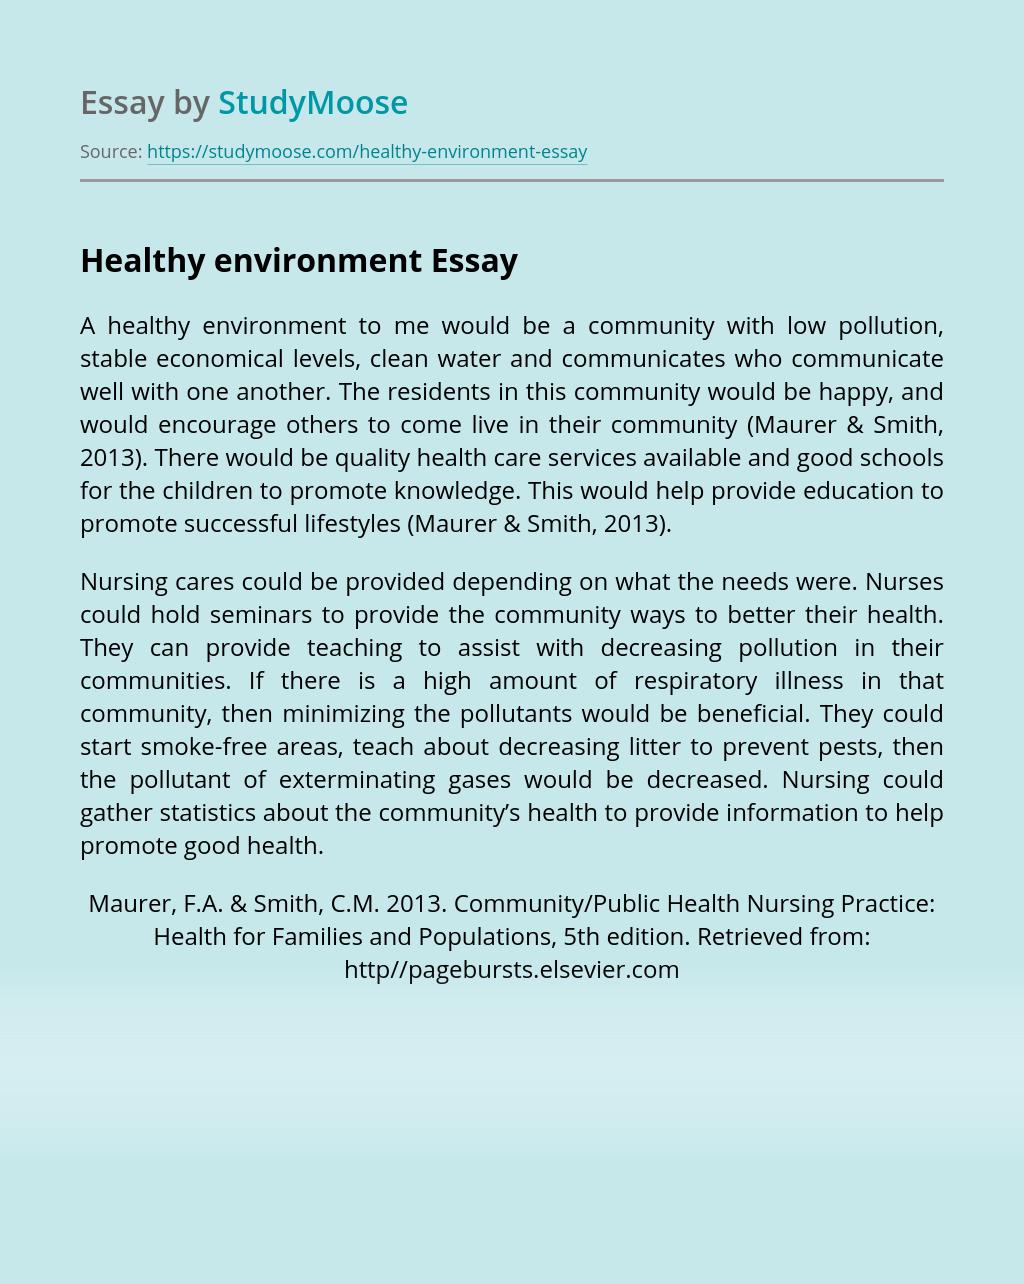 Healthy environment